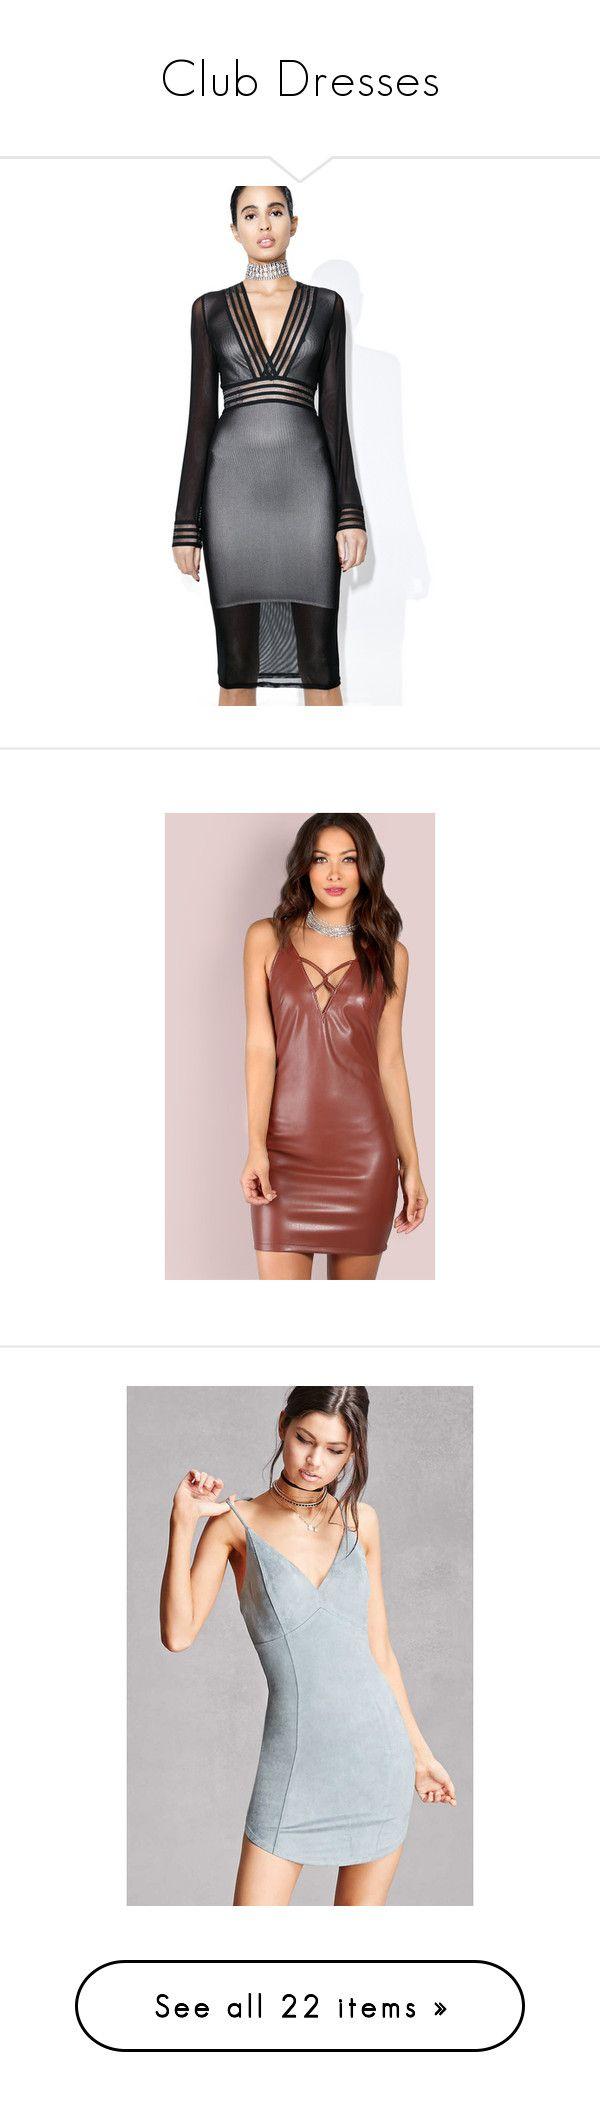 """Club Dresses"" by evekhalili ❤ liked on Polyvore featuring dresses, sheer dress, sheer mini dress, empire waist dress, sexy sheer dress, short ball dresses, brown, brown dress, slip dresses and short sleeve dress"